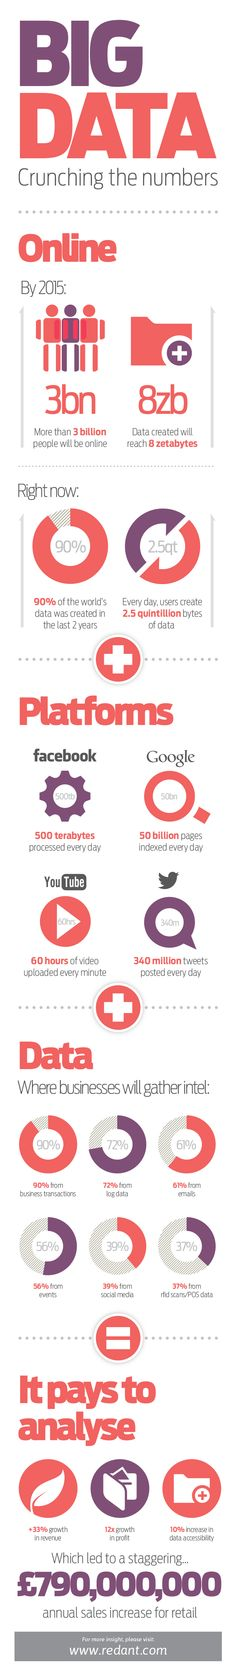 Big Data - Crunching the numbers